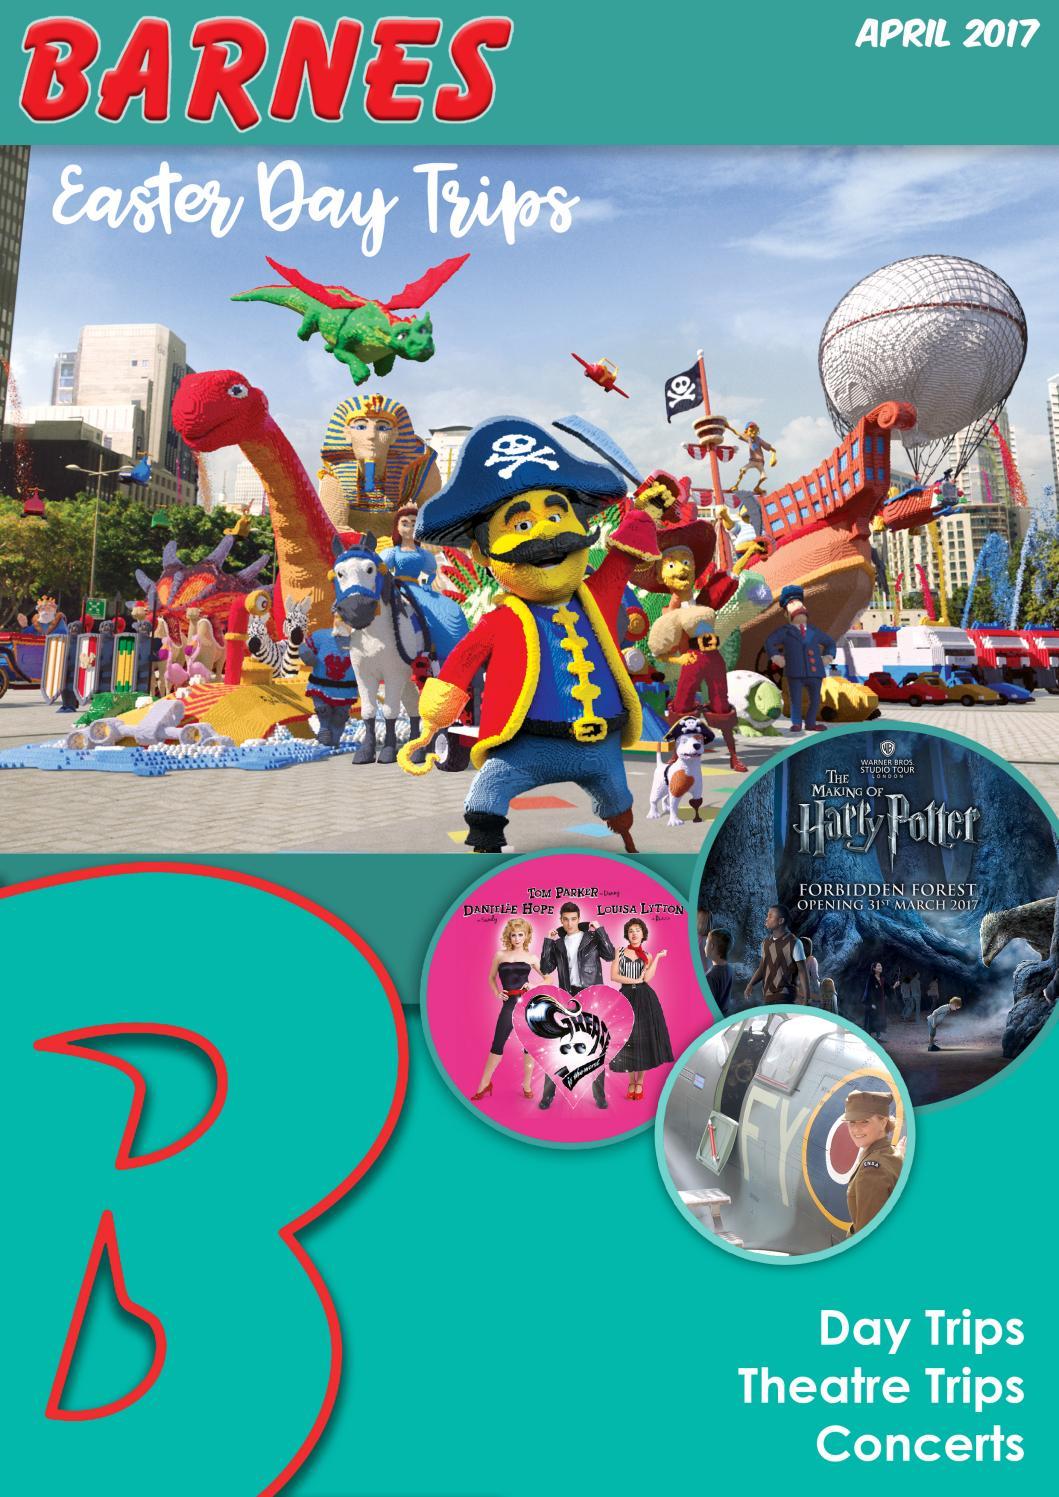 Day Trip Brochure - Apr 2017 by Barnes Coaches - Issuu